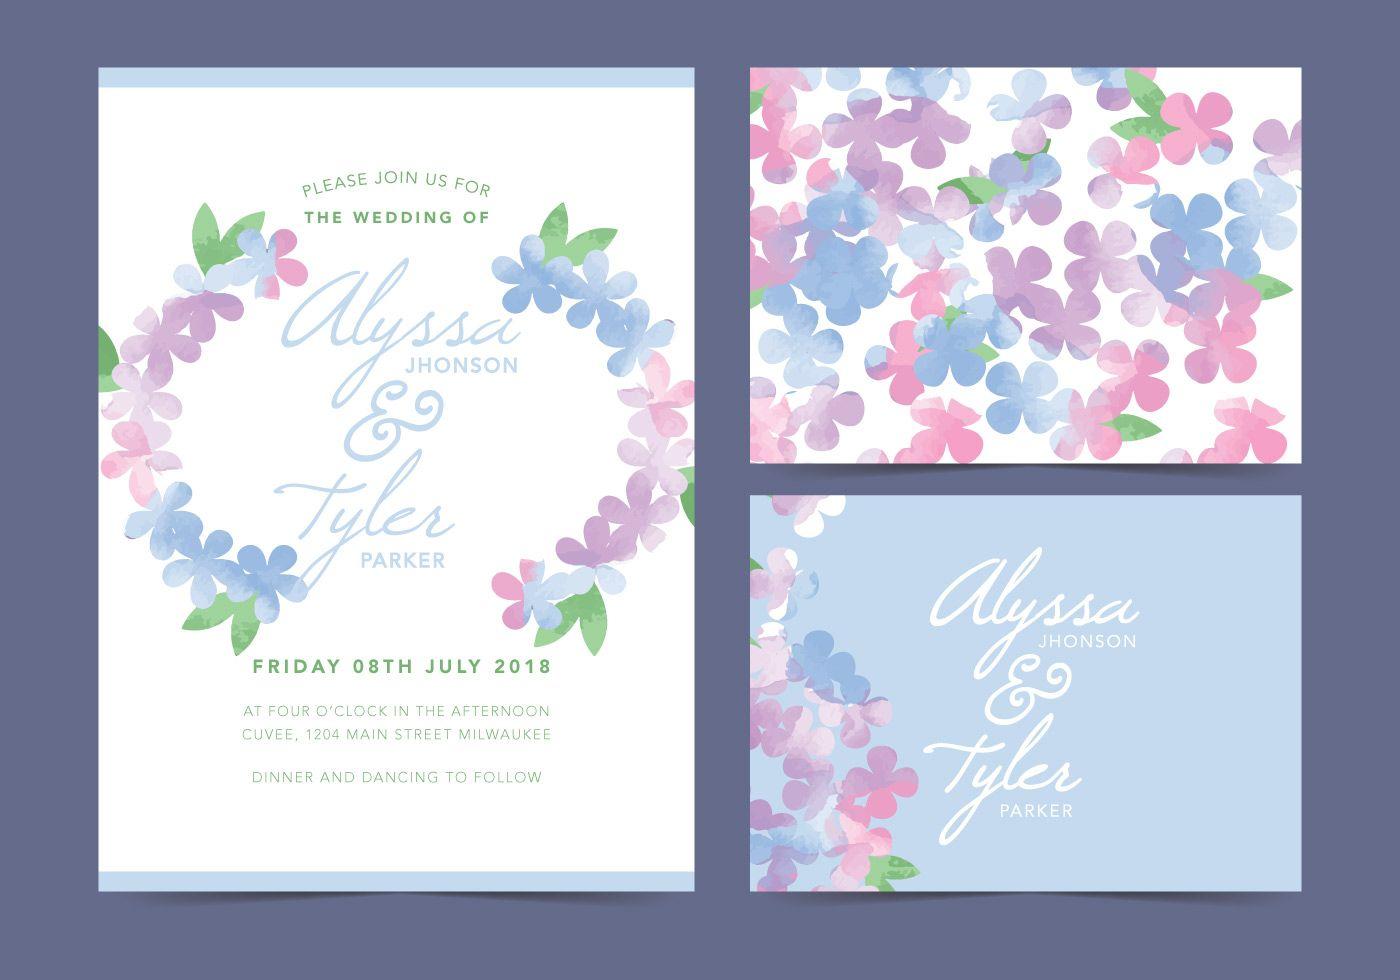 White Floral Vector Wedding Invite | Design Material | Pinterest ...